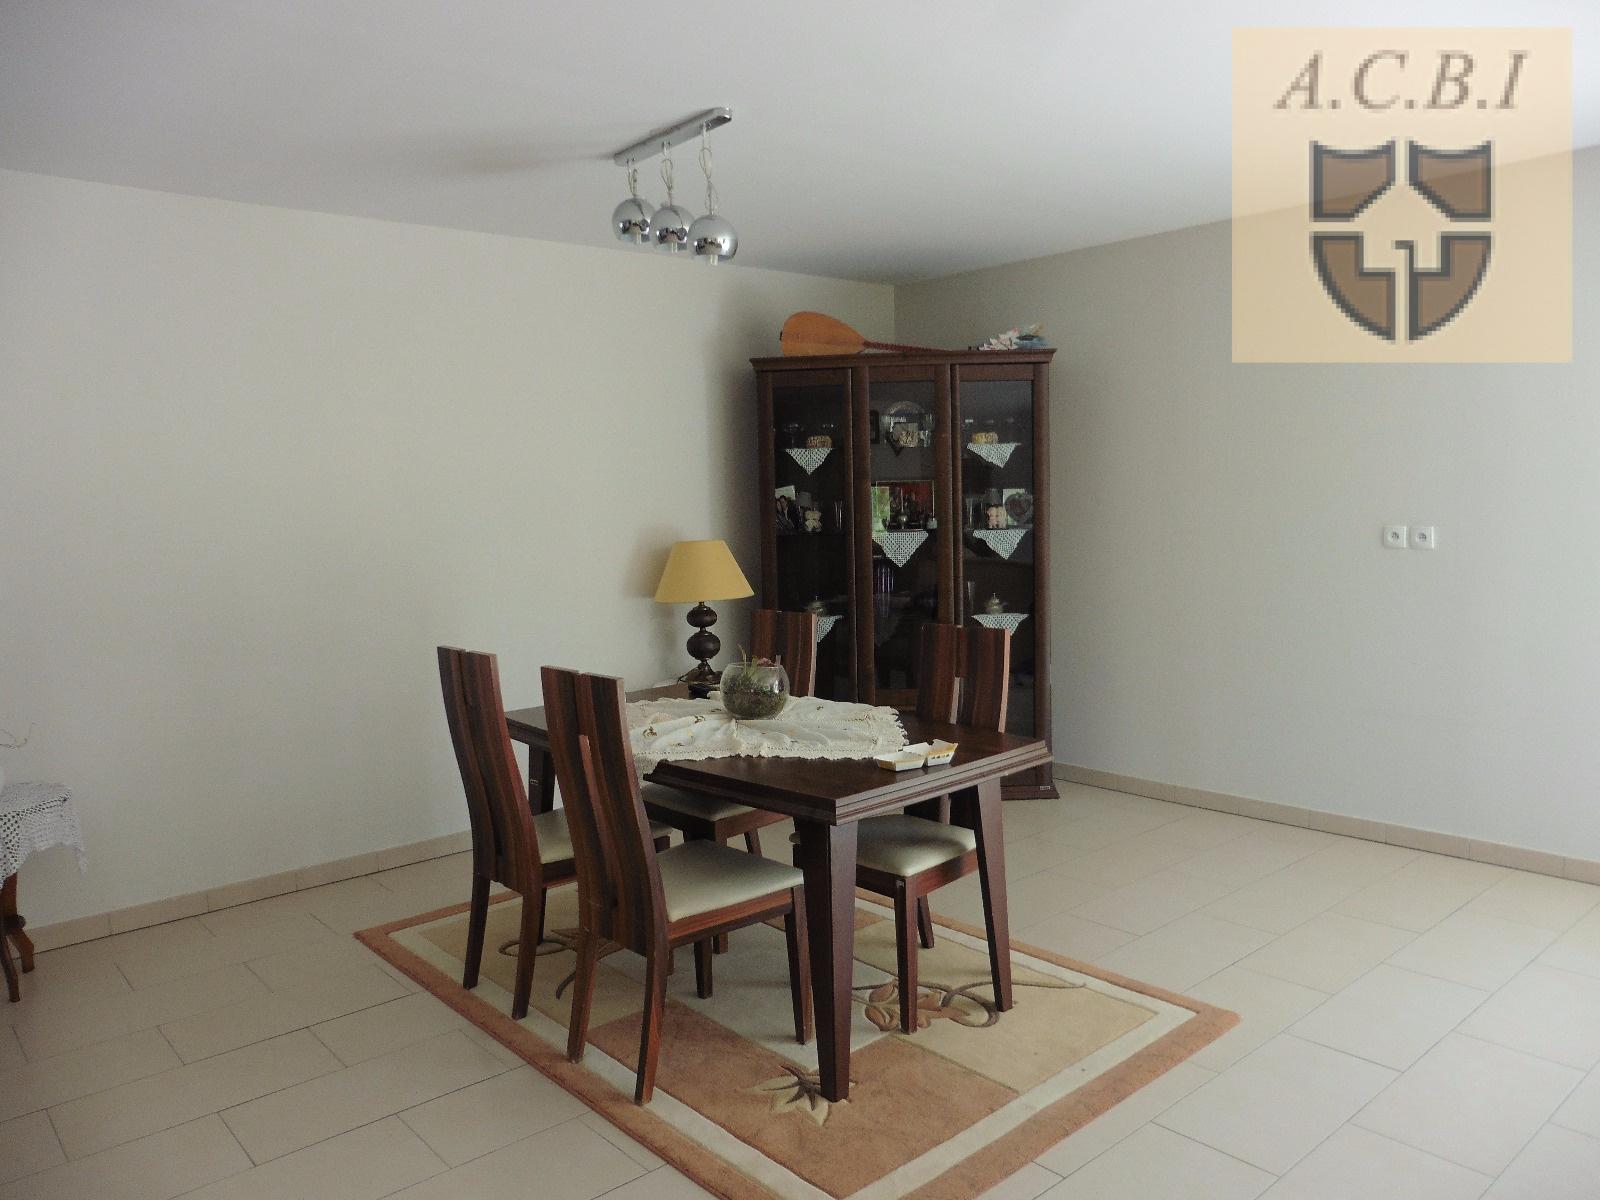 vente 10 mn nord vendome espace et confort. Black Bedroom Furniture Sets. Home Design Ideas